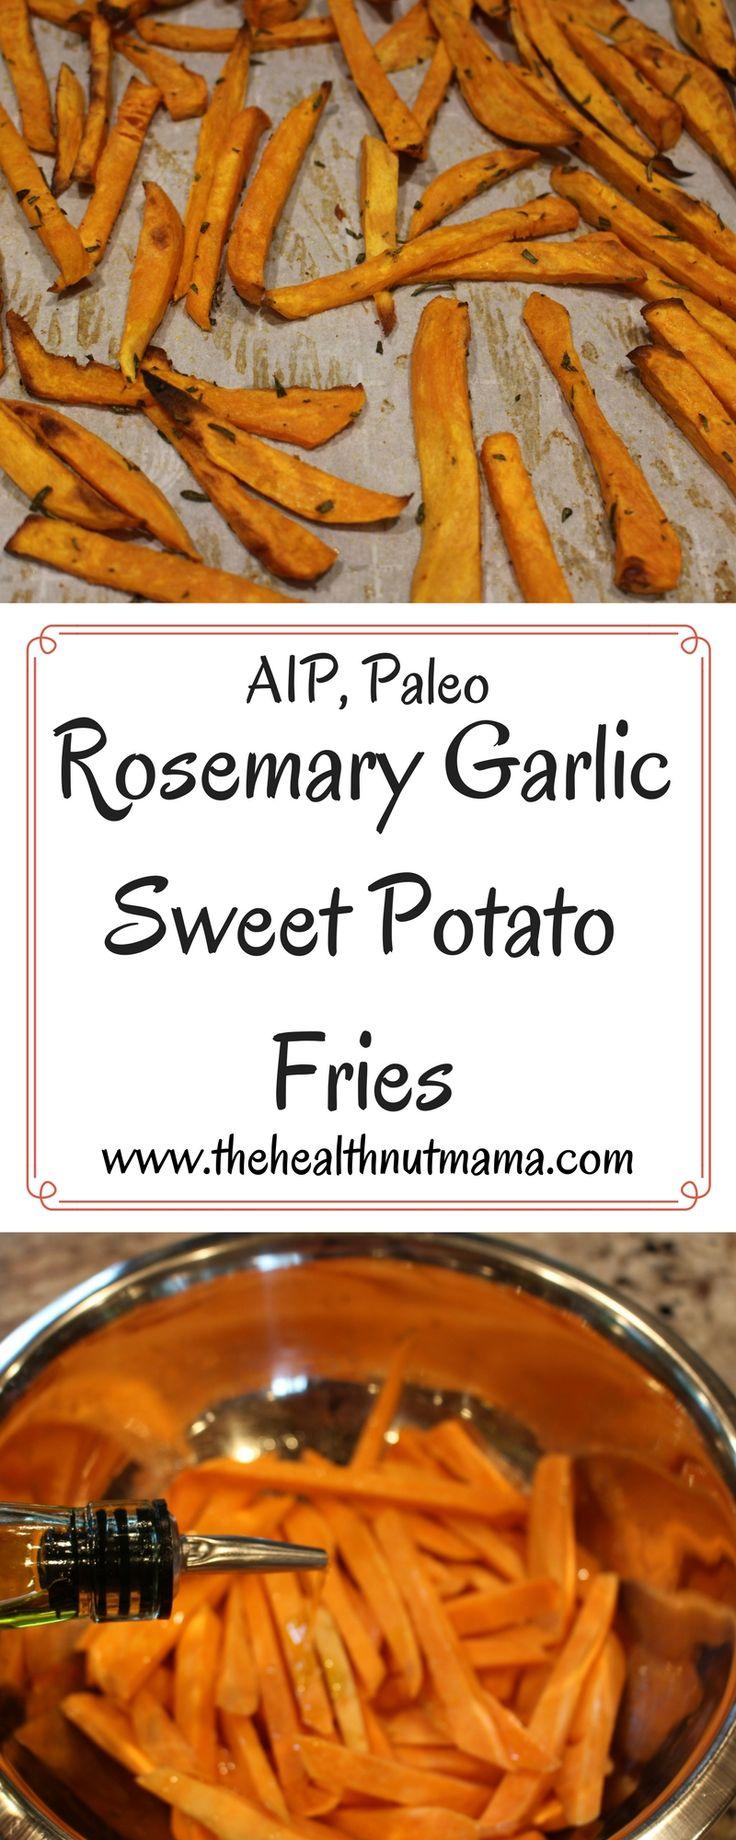 Quick & Delicious Rosemary Garlic Sweet Potato Fries! (AIP, Paleo) www ...